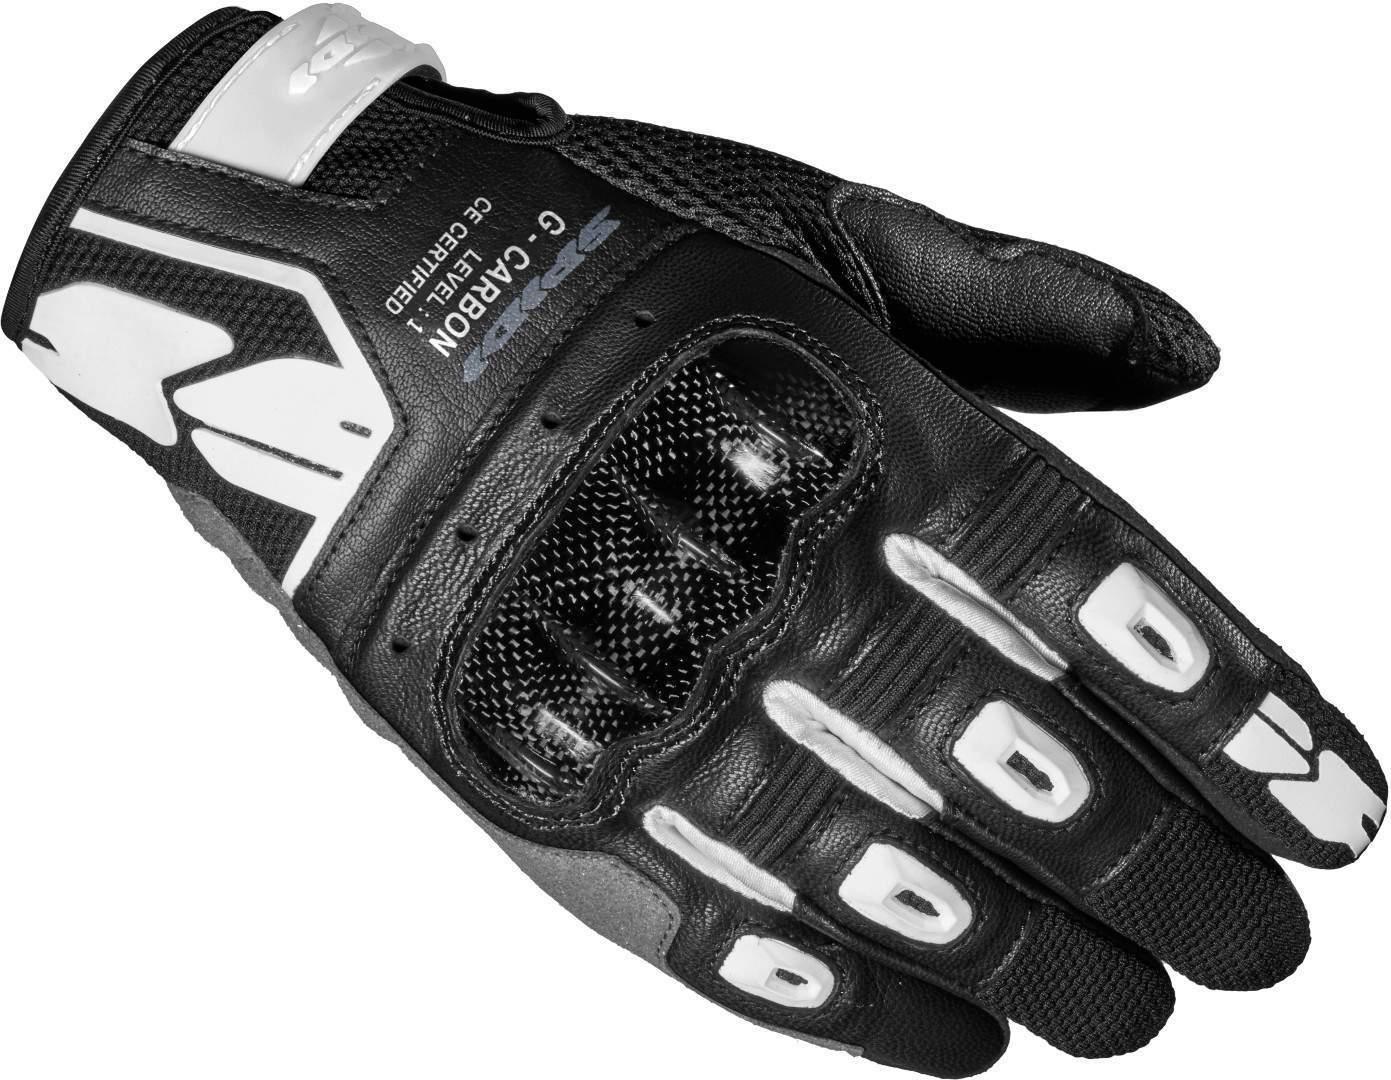 Spidi G-Carbon Botas de moto para mujer Negro Blanco XL